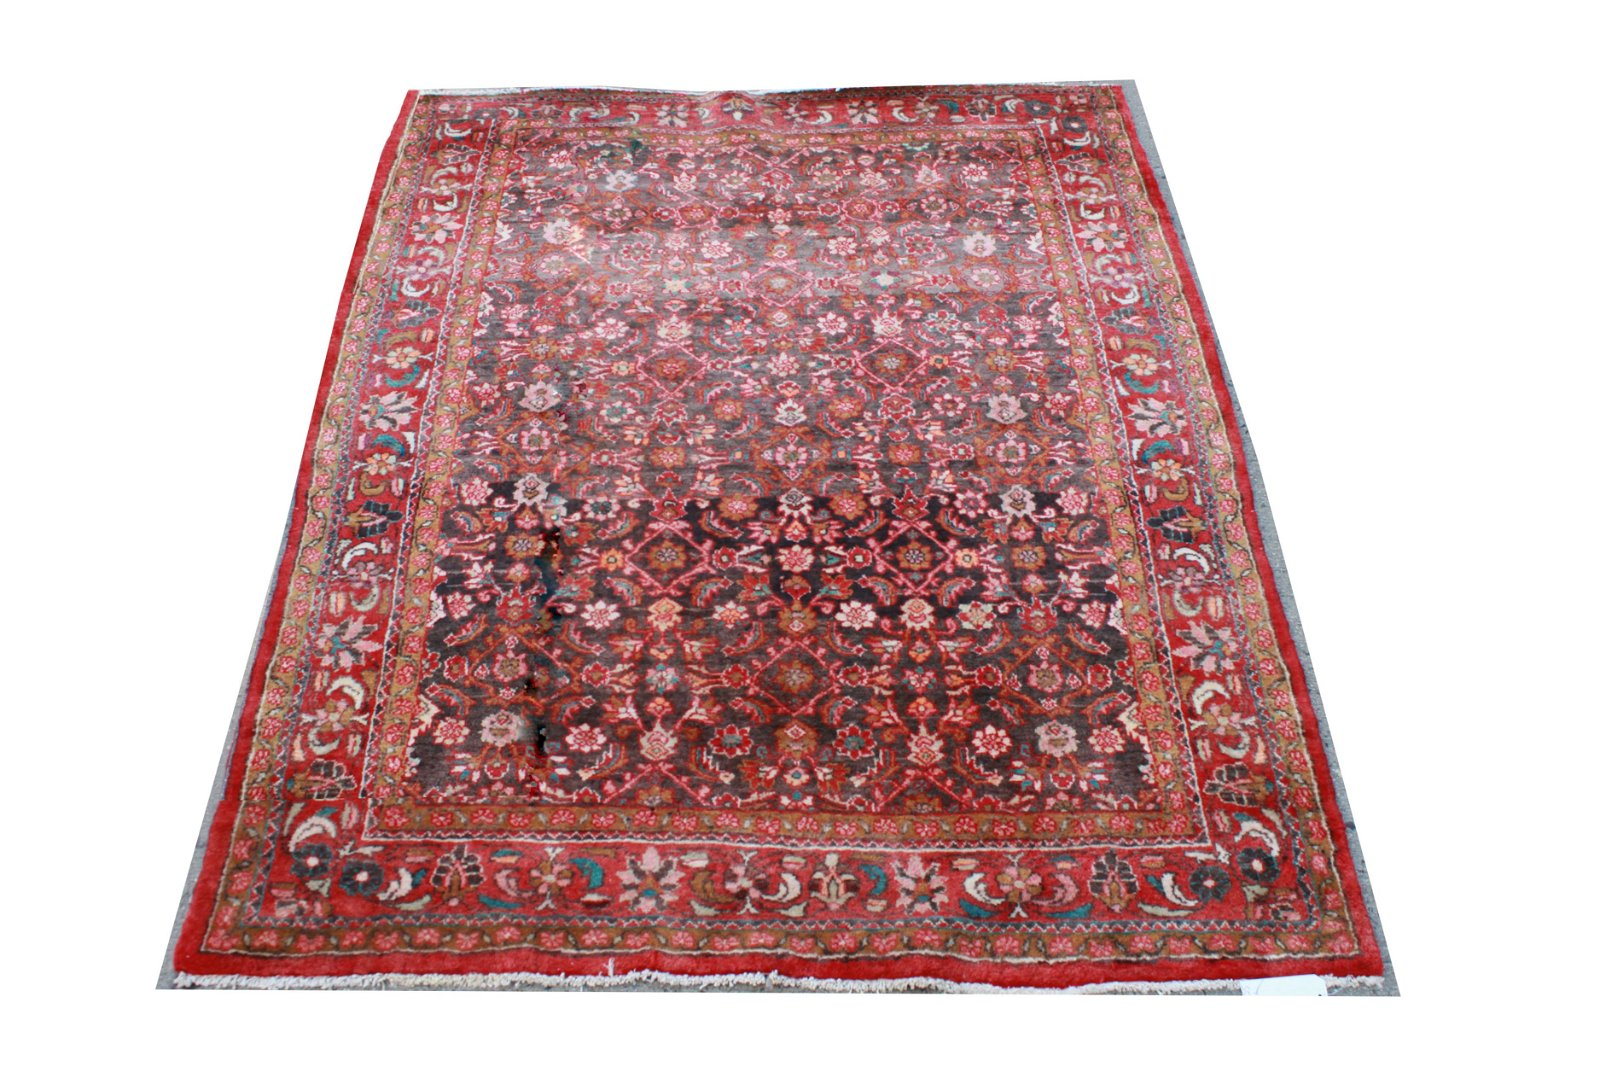 "Bijar Persian Carpet 5' 5"" x 6' 8"""